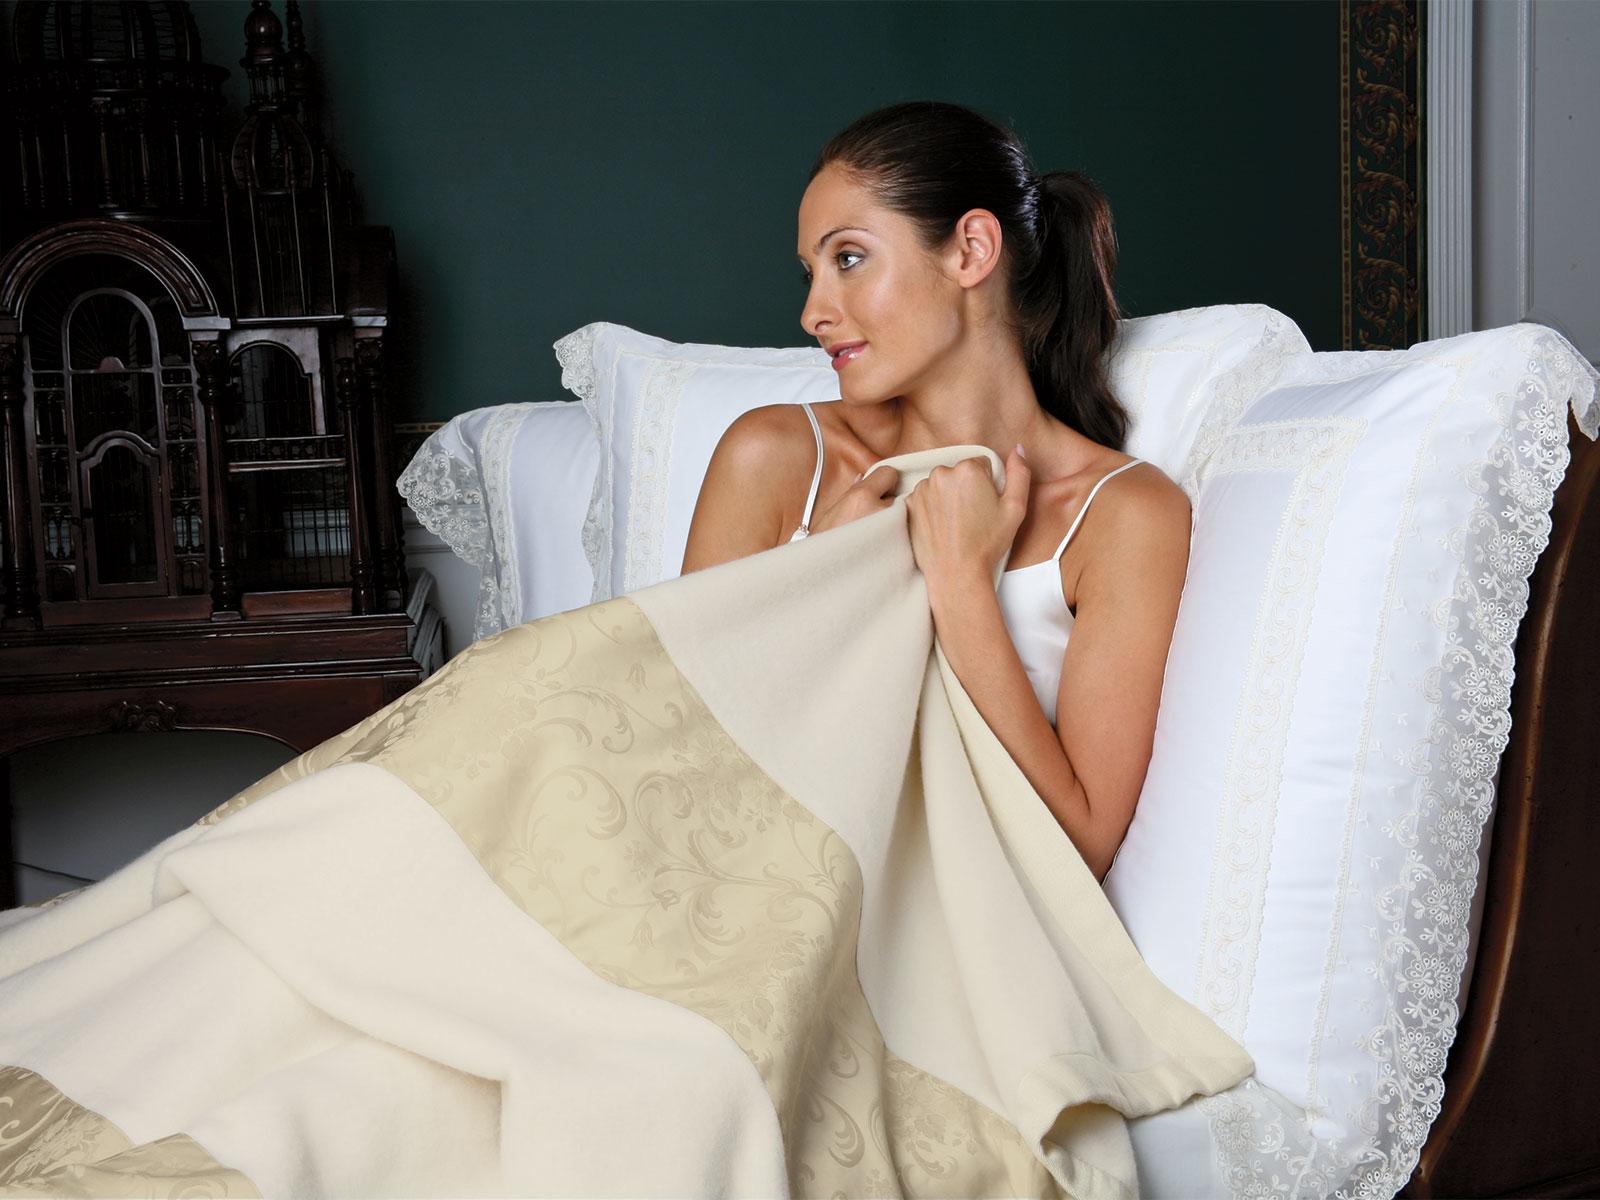 armonia cashmere blanket - Cashmere Blanket